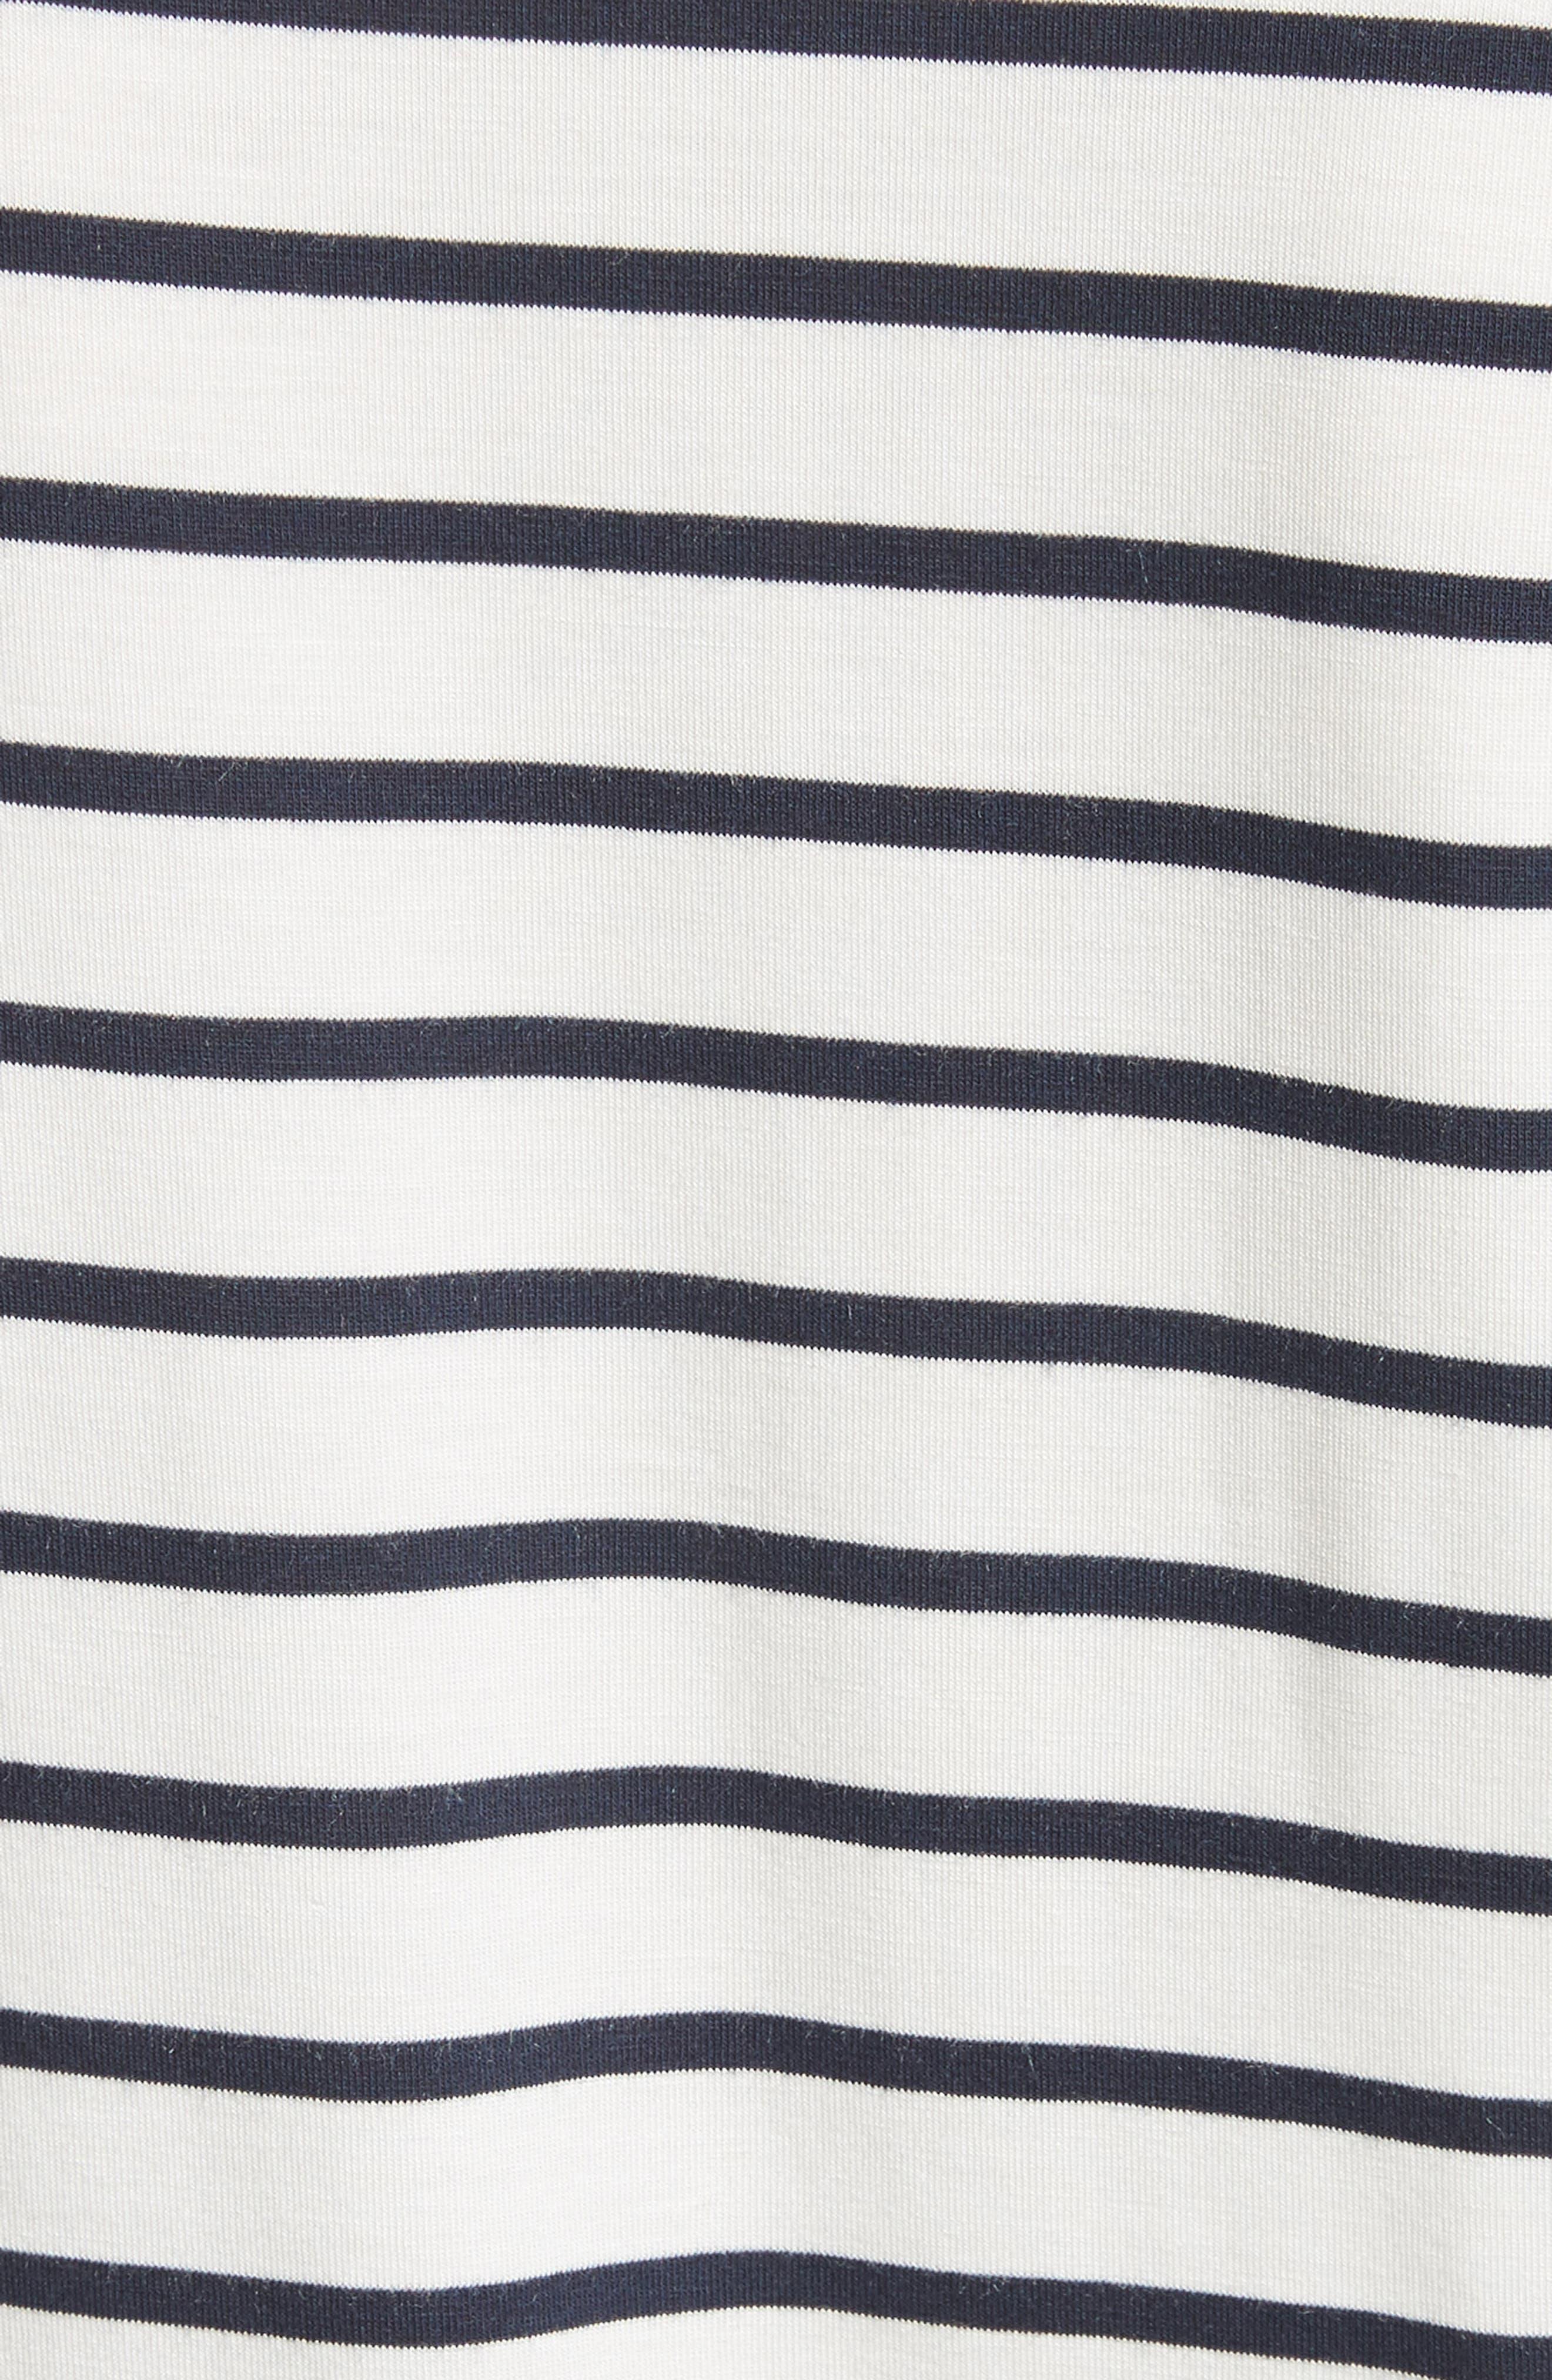 Stripe Boat Neck Top,                             Alternate thumbnail 5, color,                             402